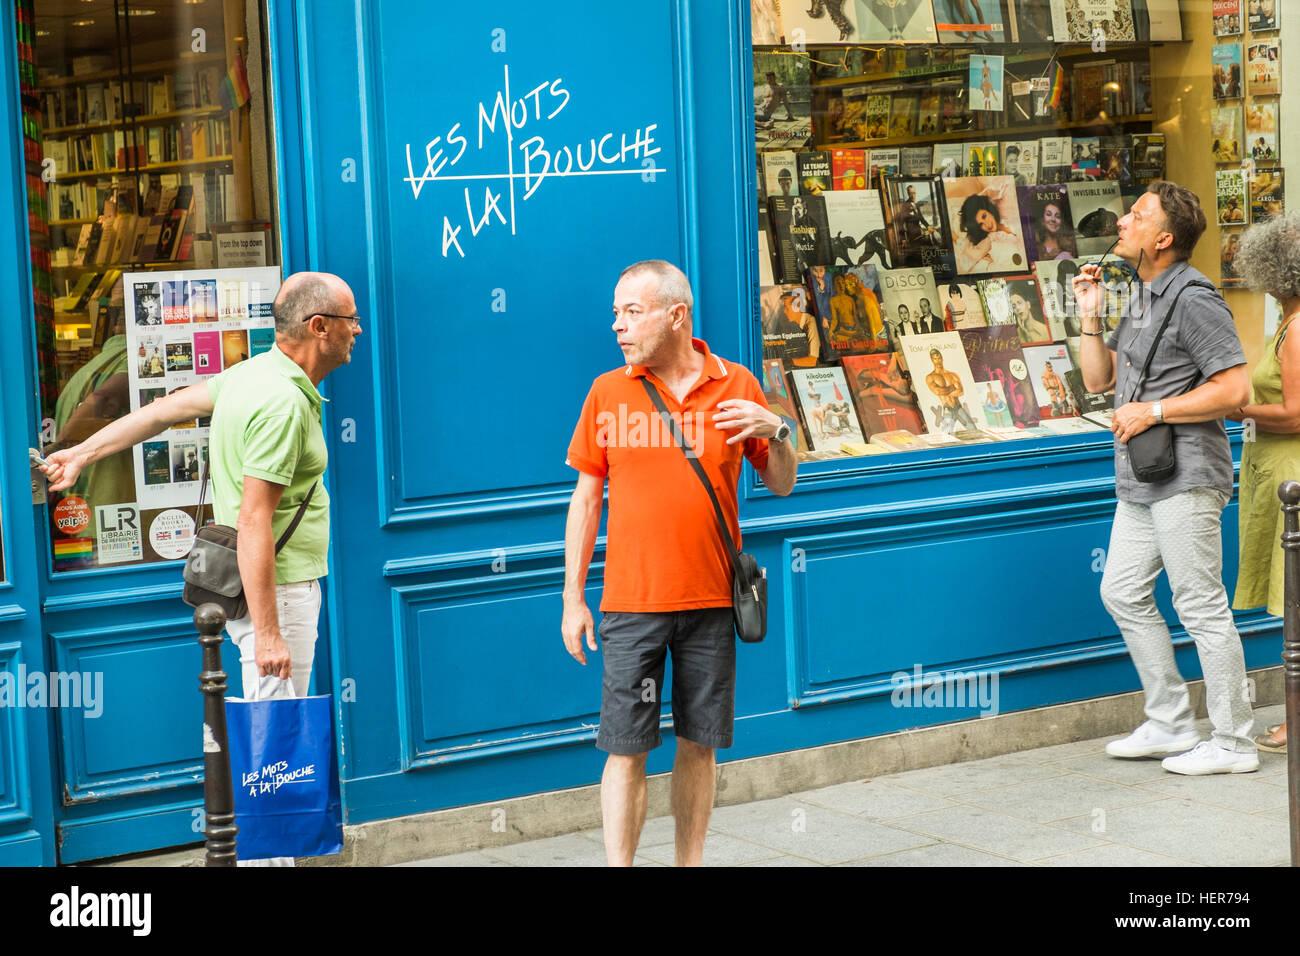 street scene in front of les mots a la bouche gay bookstore - Stock Image